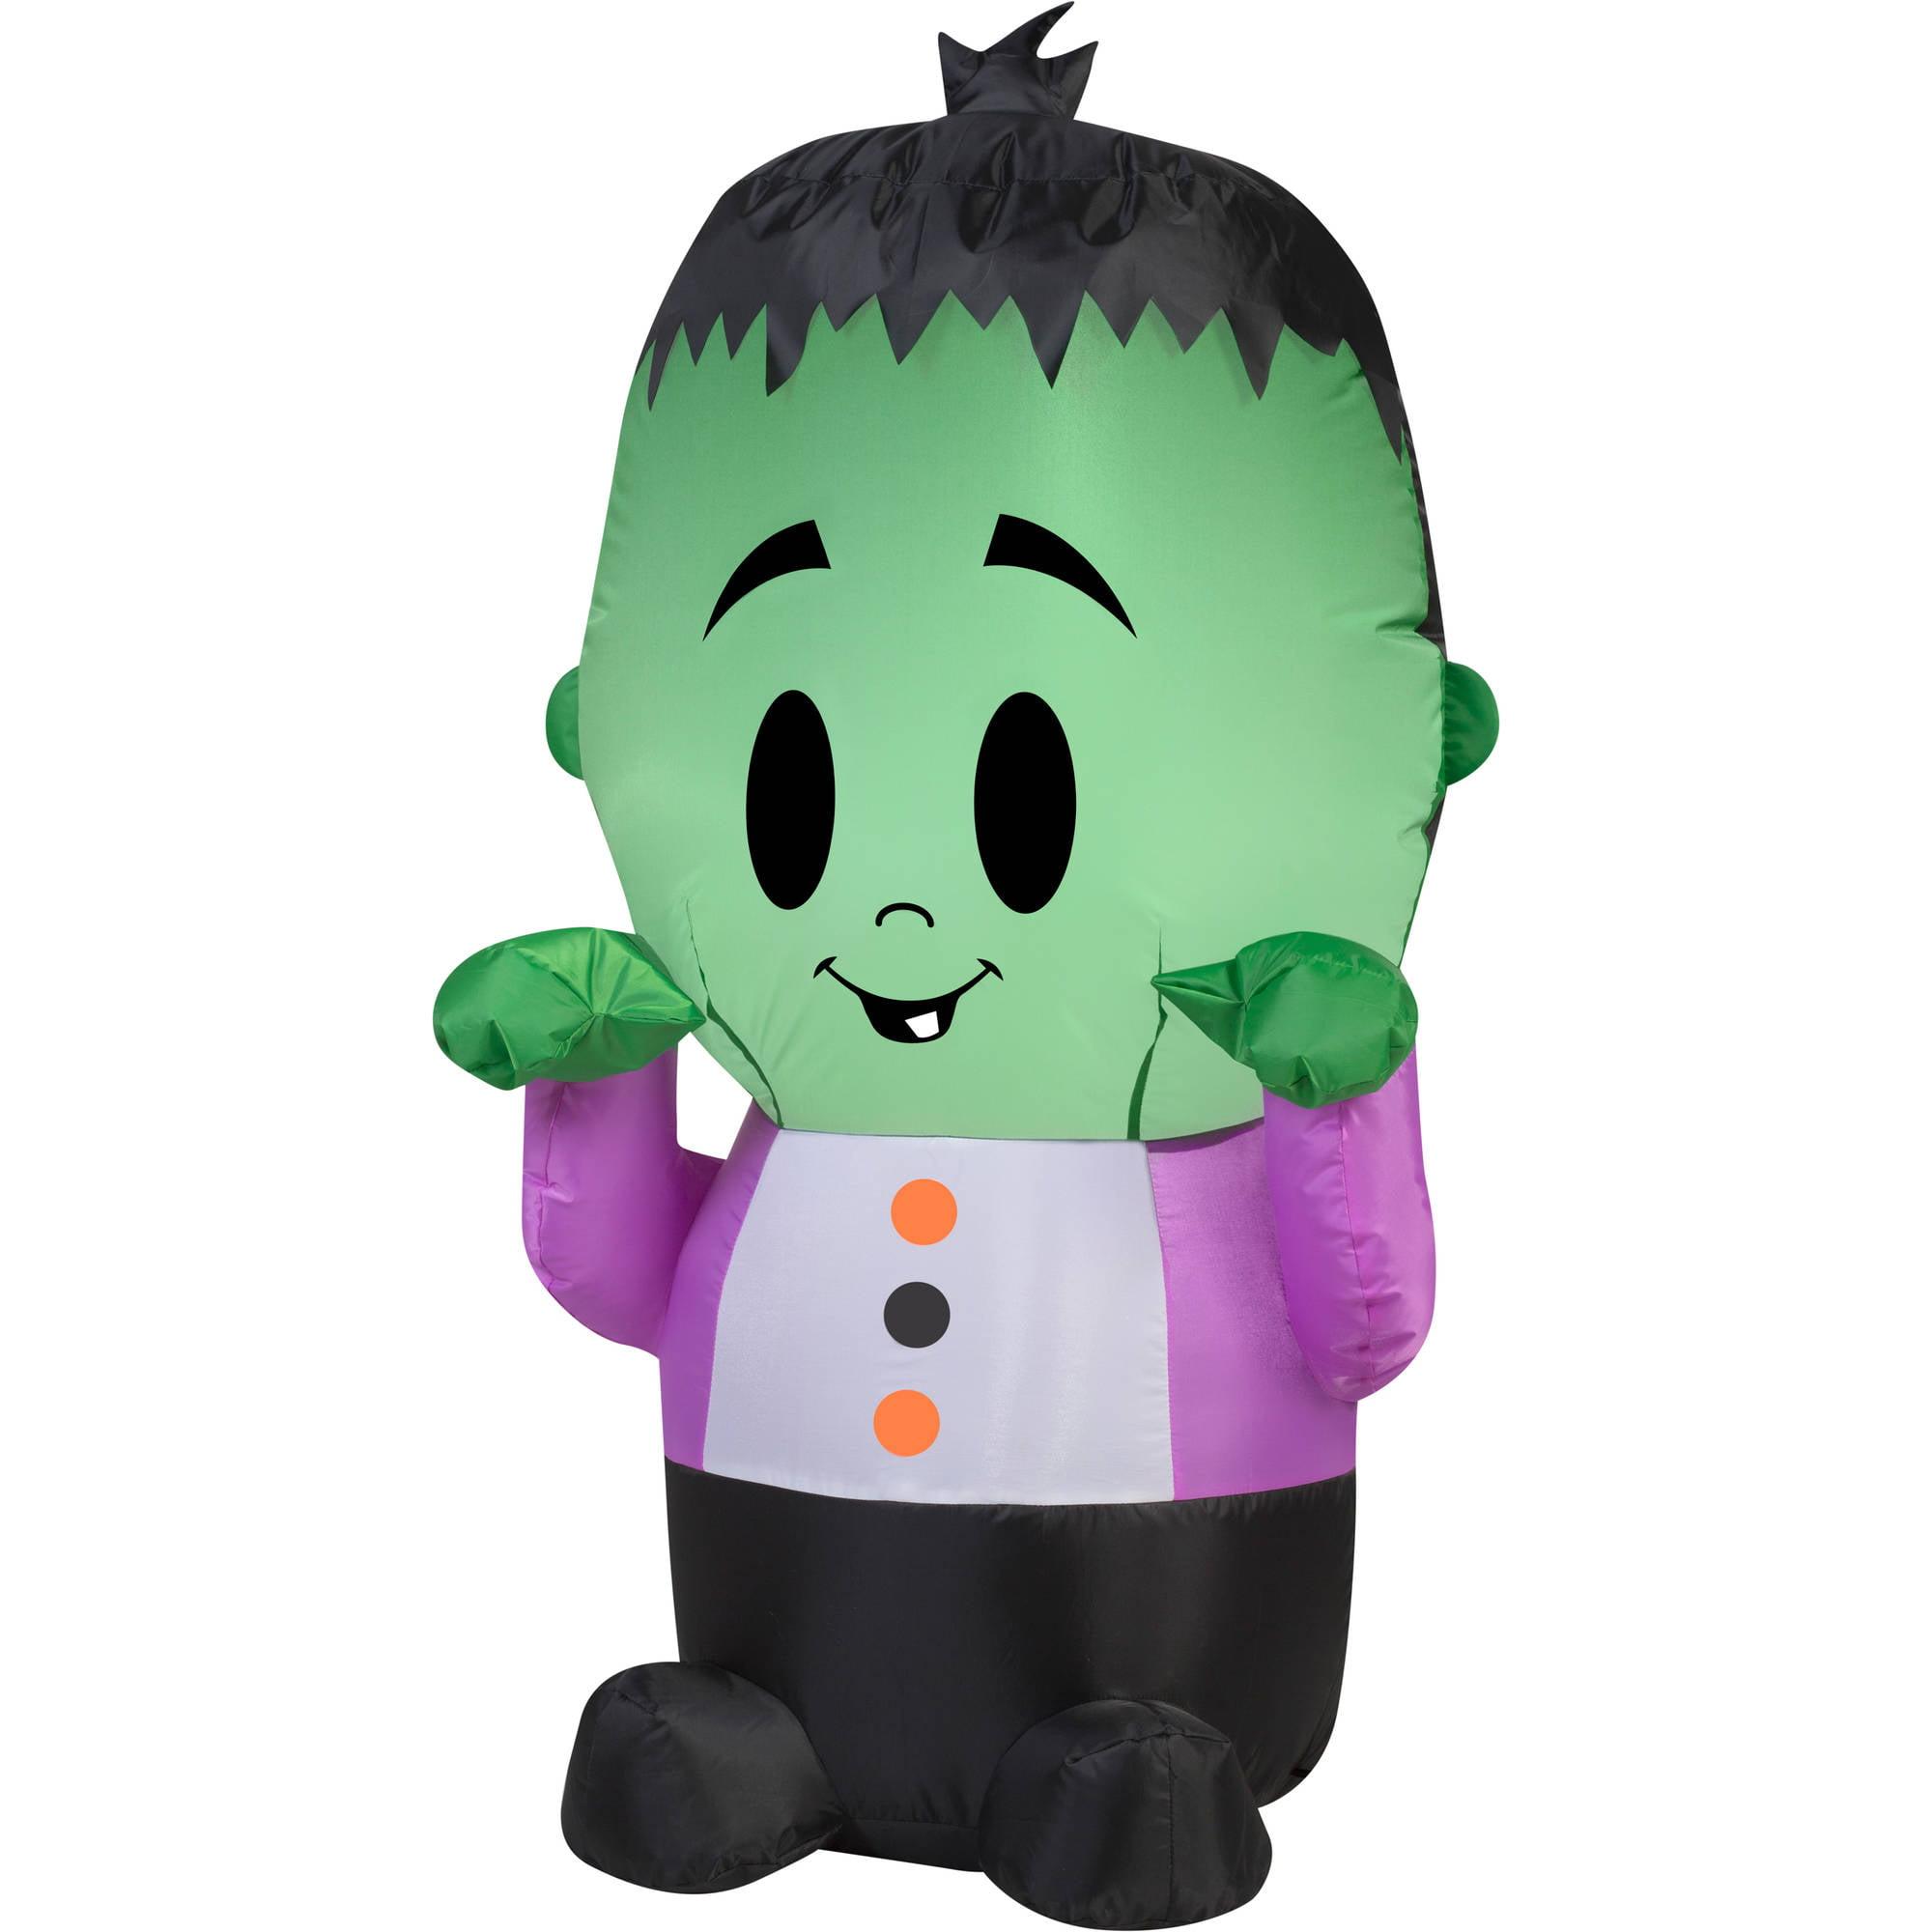 Gemmy Airblown Inflatable 3.5' X 2' Happy Monster Halloween Decoration